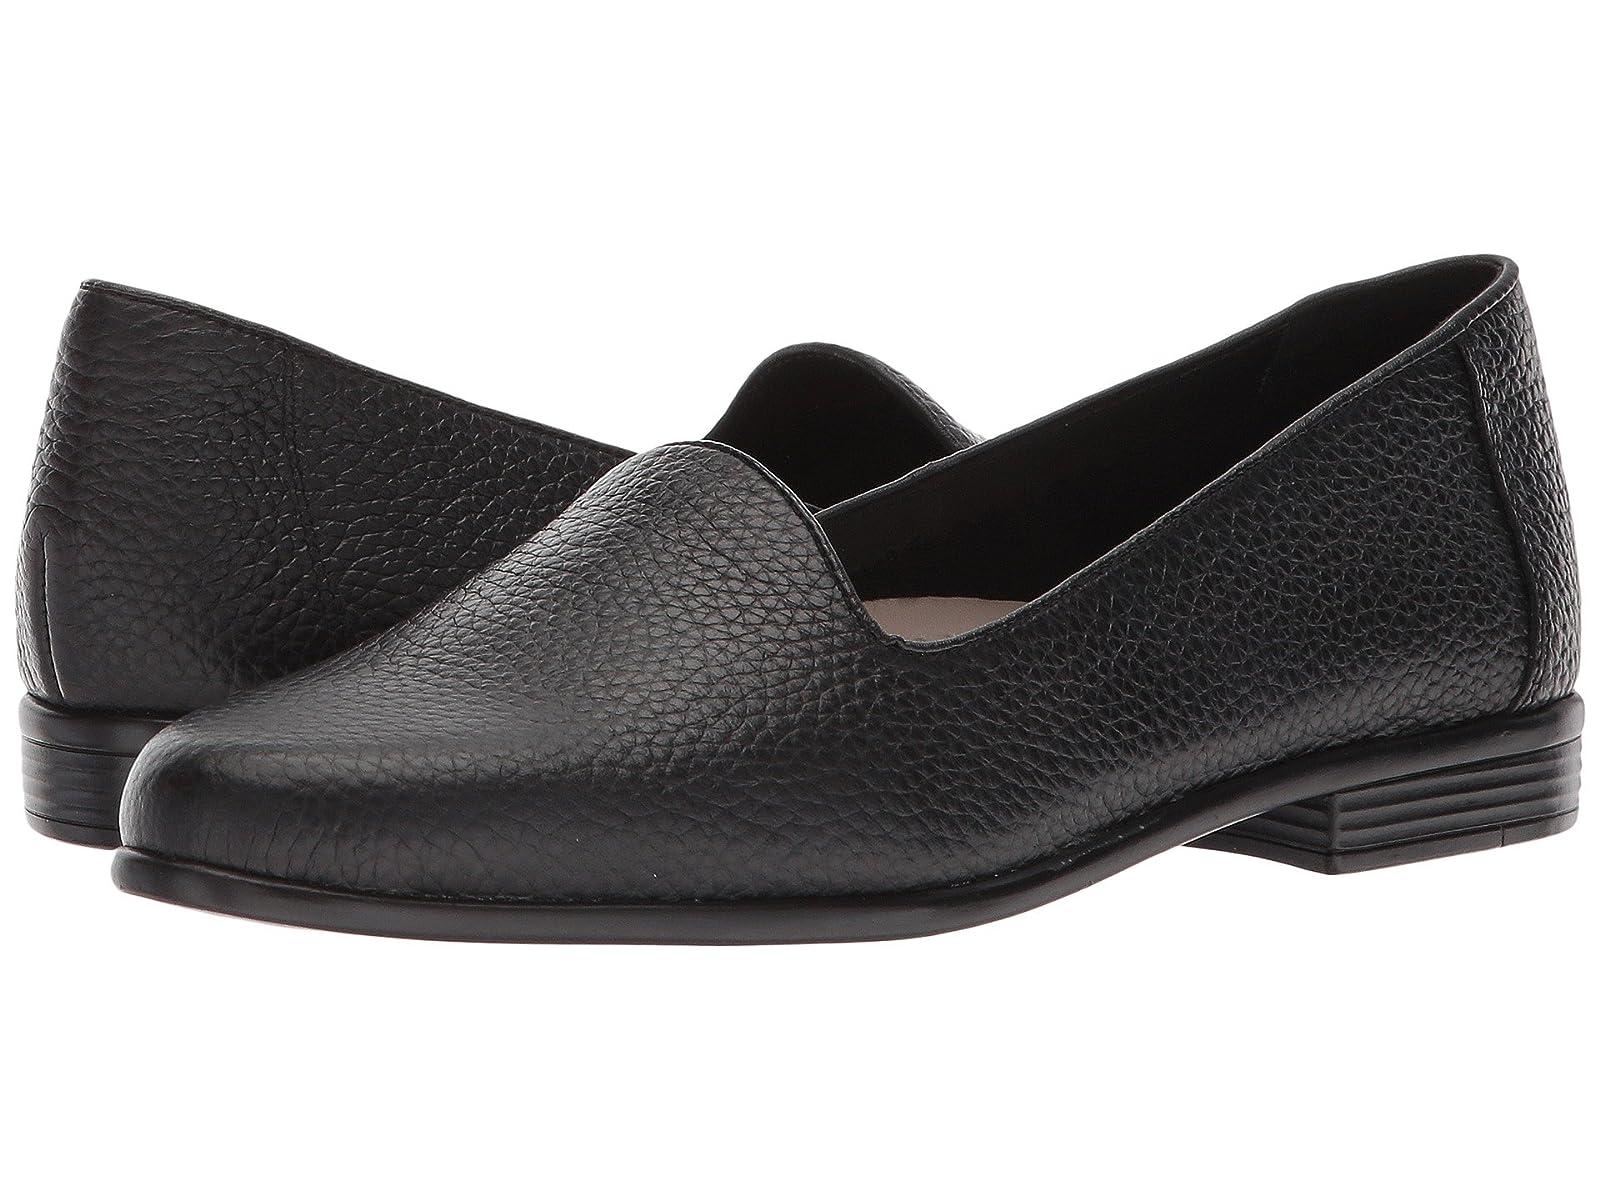 Trotters Liz TumbledAtmospheric grades have affordable shoes